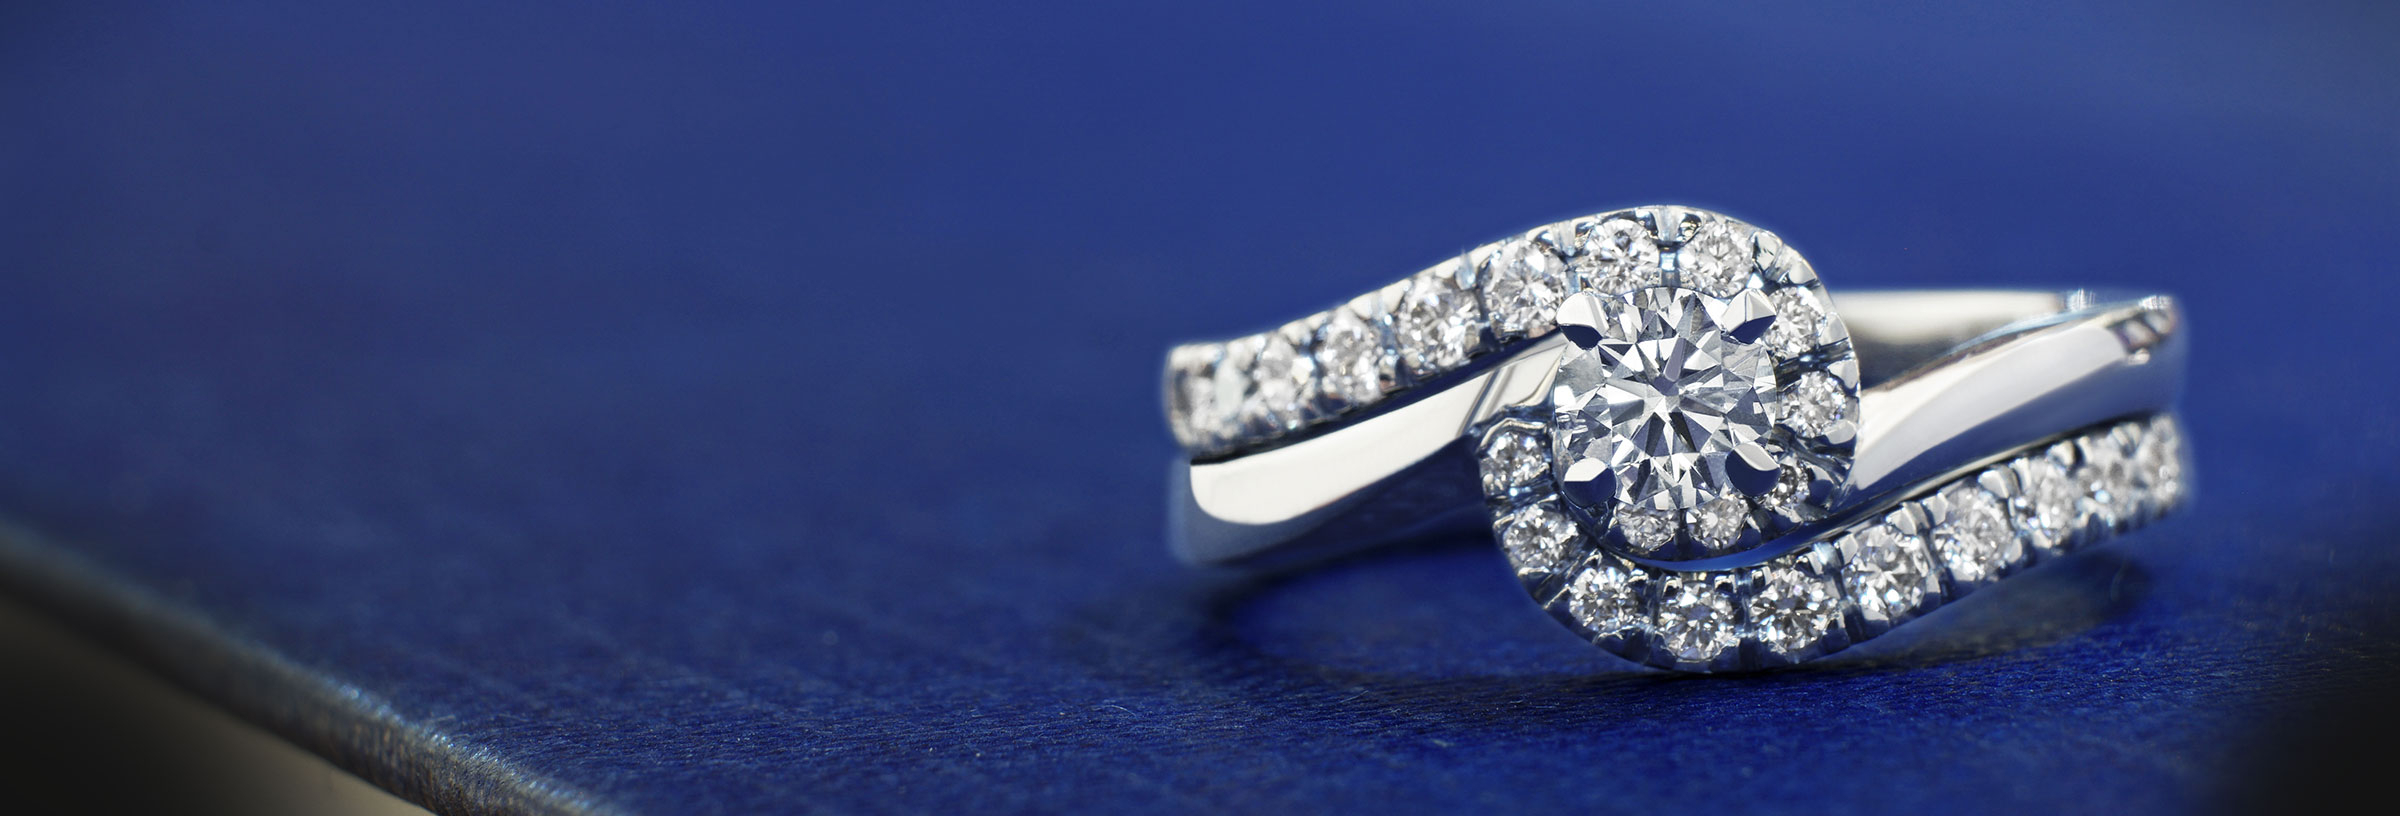 Wave Shaped Wedding Rings | Harriet Kelsall Regarding Recent Wave Diamond Wedding Bands (View 4 of 25)